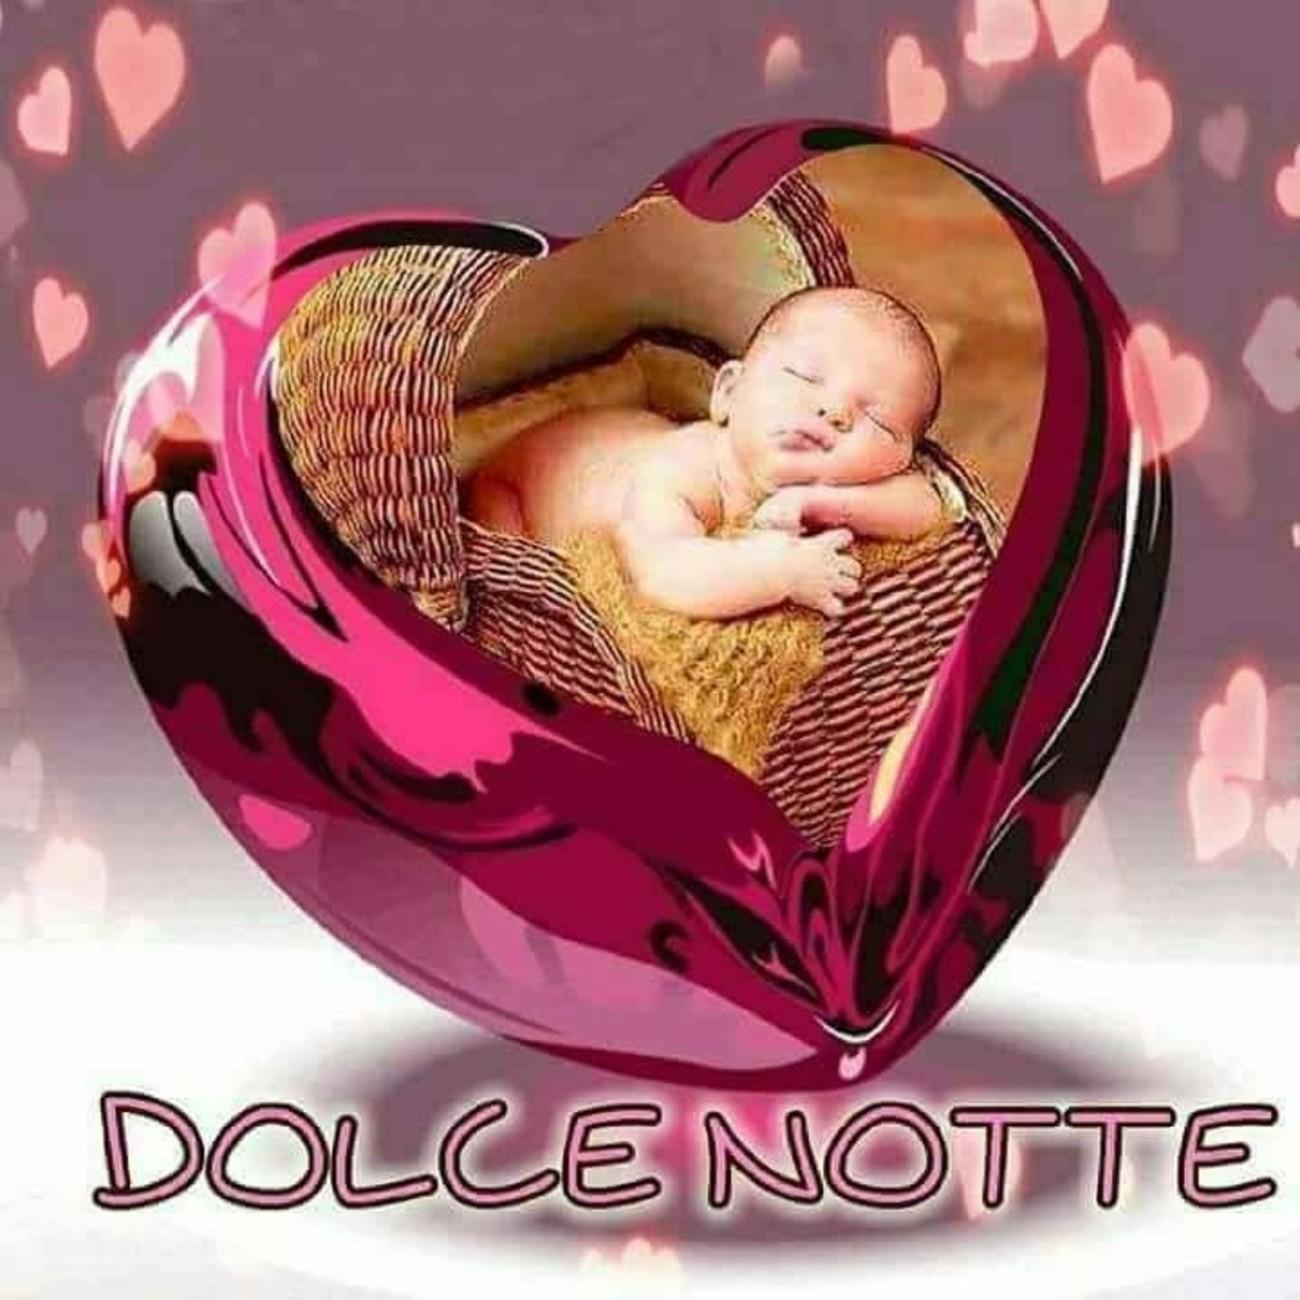 Immagini gratis buonanotte (5)